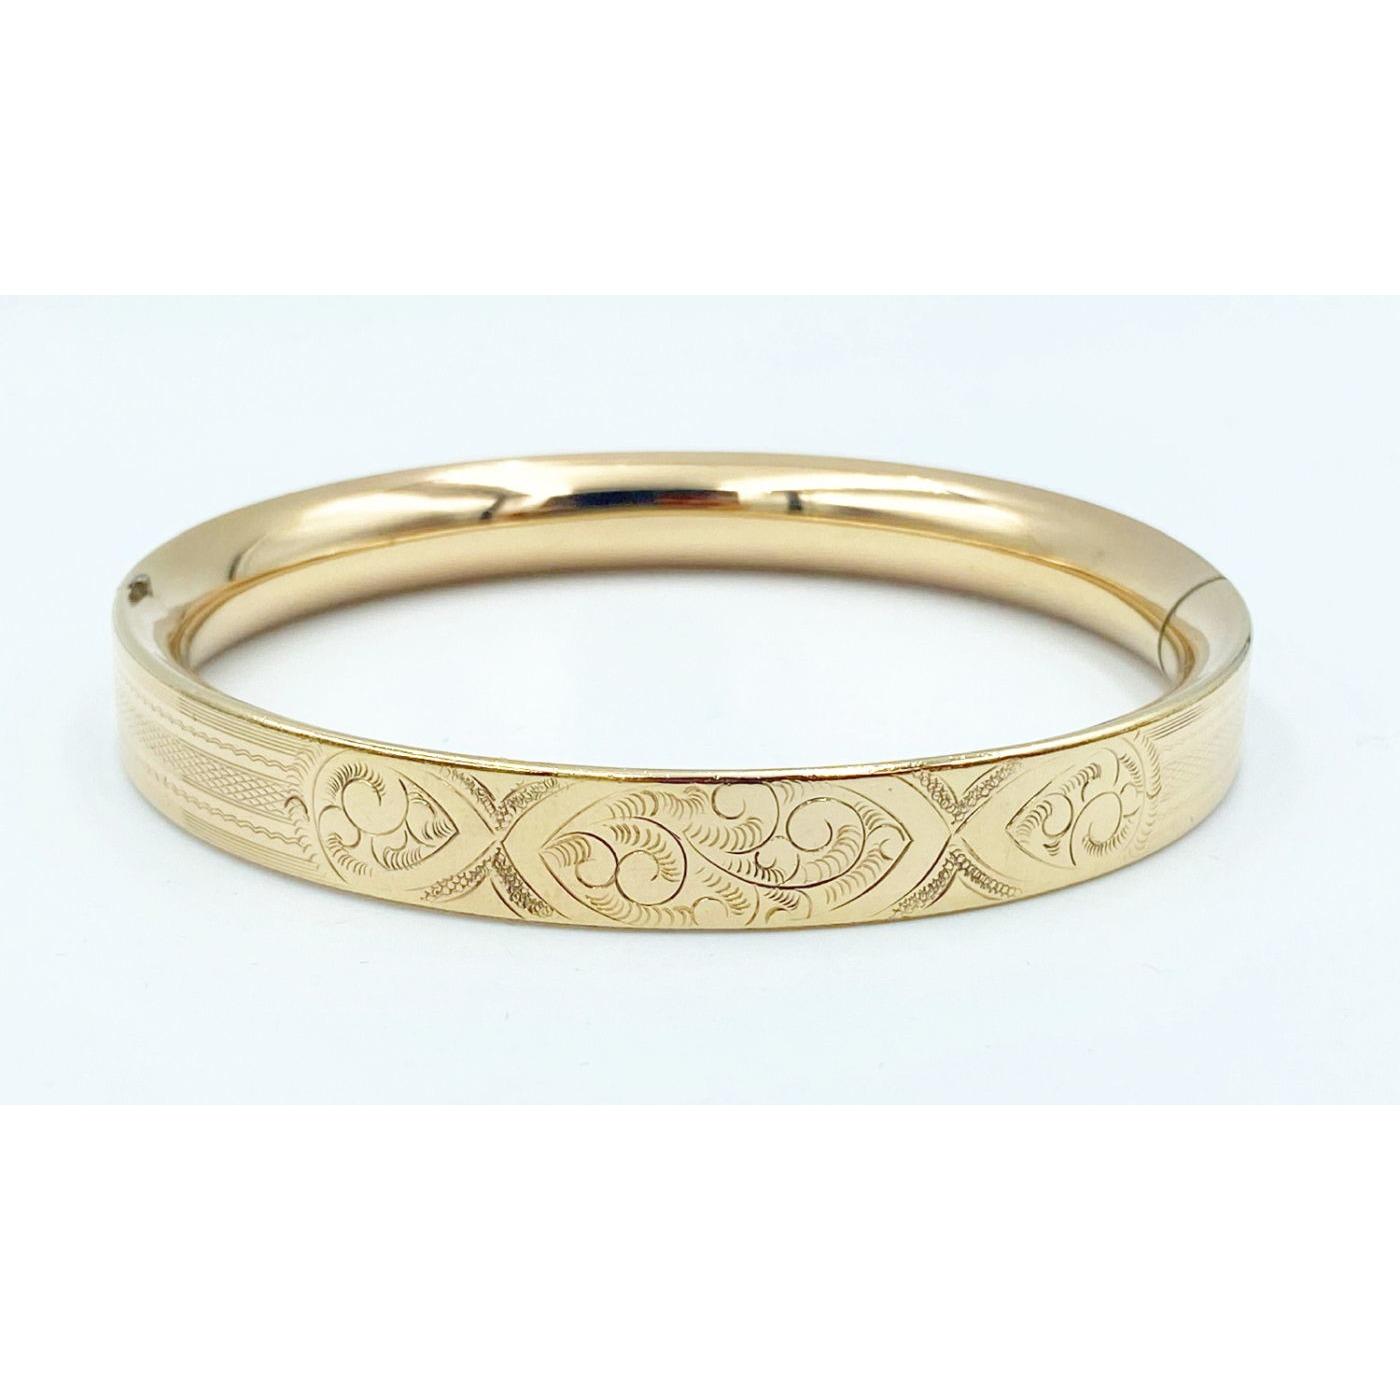 Squared-Off Lightly Engraved Gold-Filled Engagement Bangle